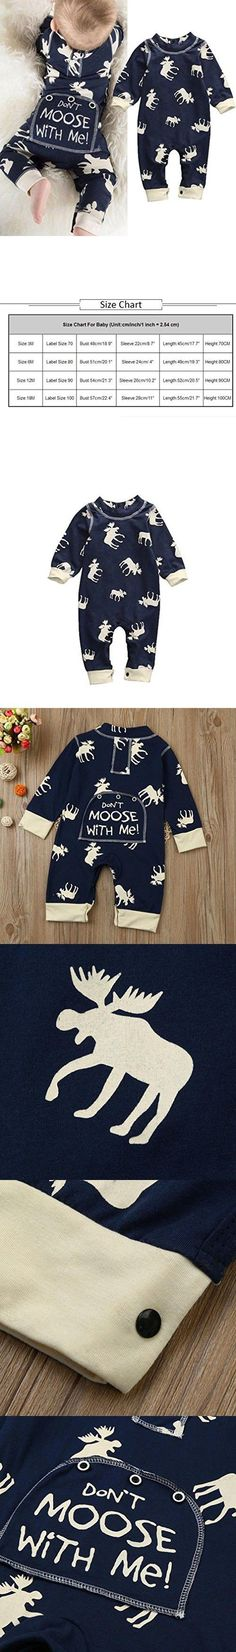 Romper ,OUBAO Toddler Infant Baby Boy Girl Long Sleeve Deer Romper Outfits Set Jumpsuit Bodysuit Clothes (12-18 months, Navy)  https://presentbaby.com